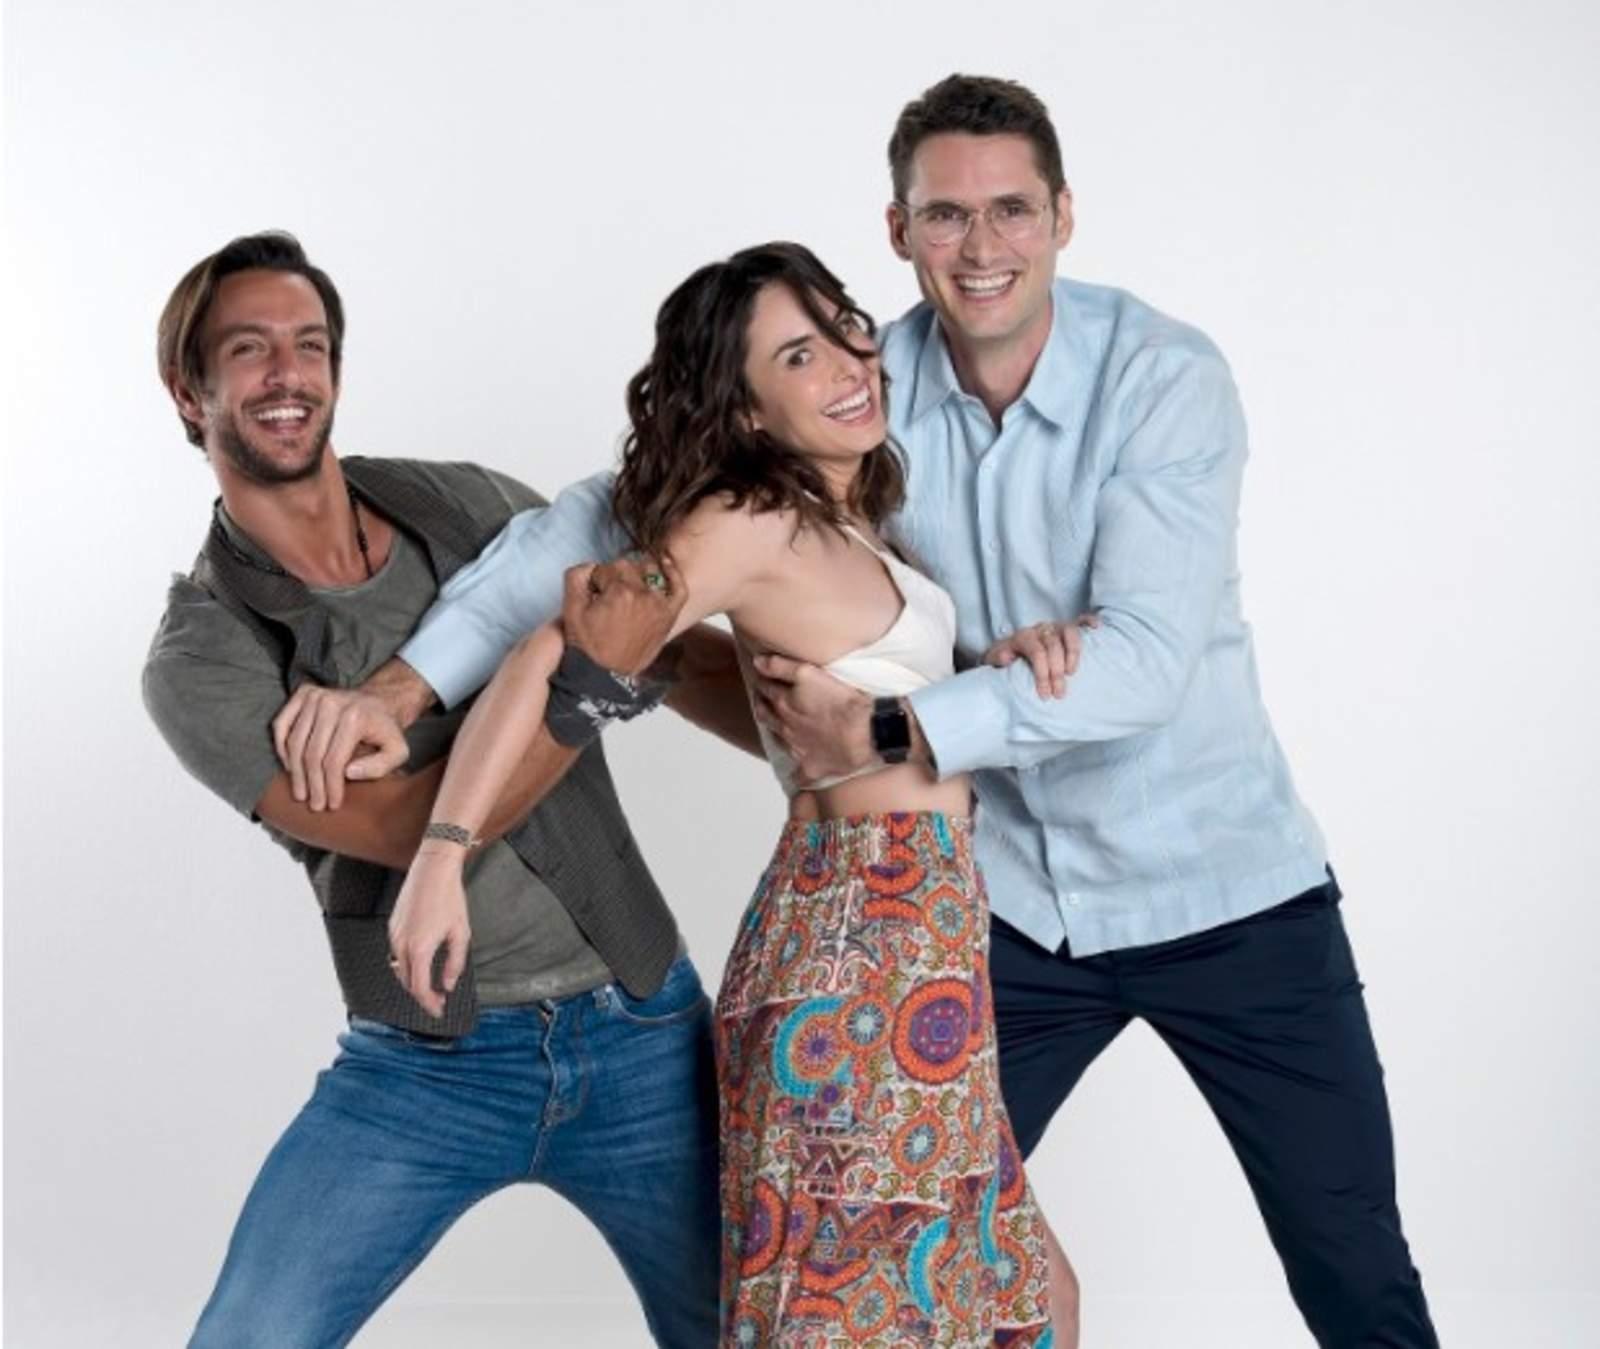 Ana Serradilla hará una nueva telenovela